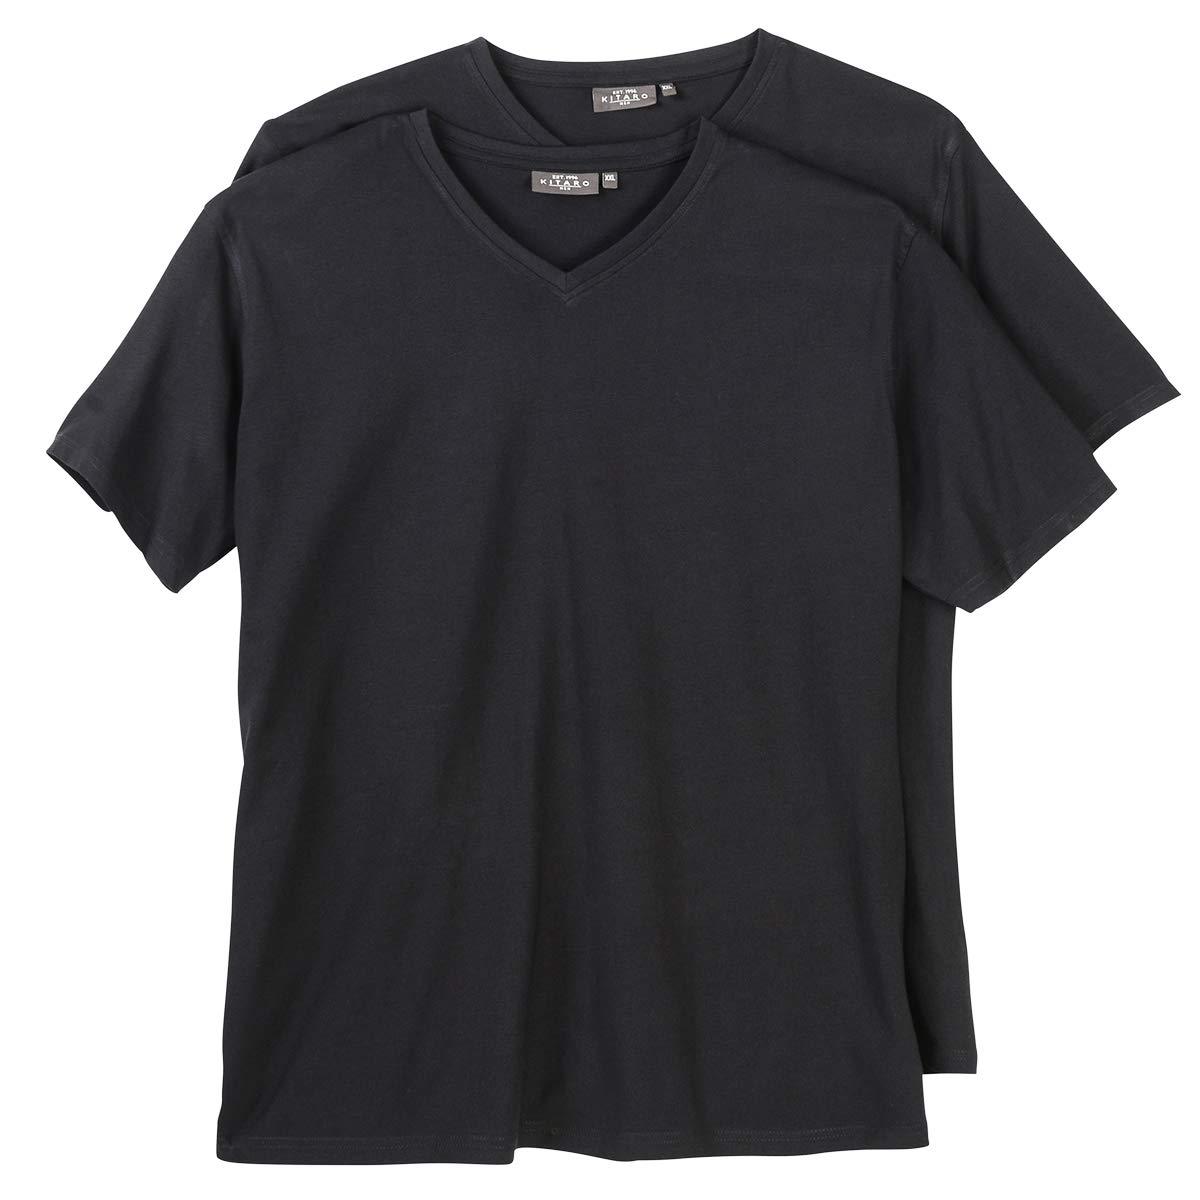 Kitaro Doppelpack V-Neck T-Shirt Herren Übergröße schwarz B00KKCROPM T-Shirts Kompletter Kompletter Kompletter Spezifikationsbereich 397b68